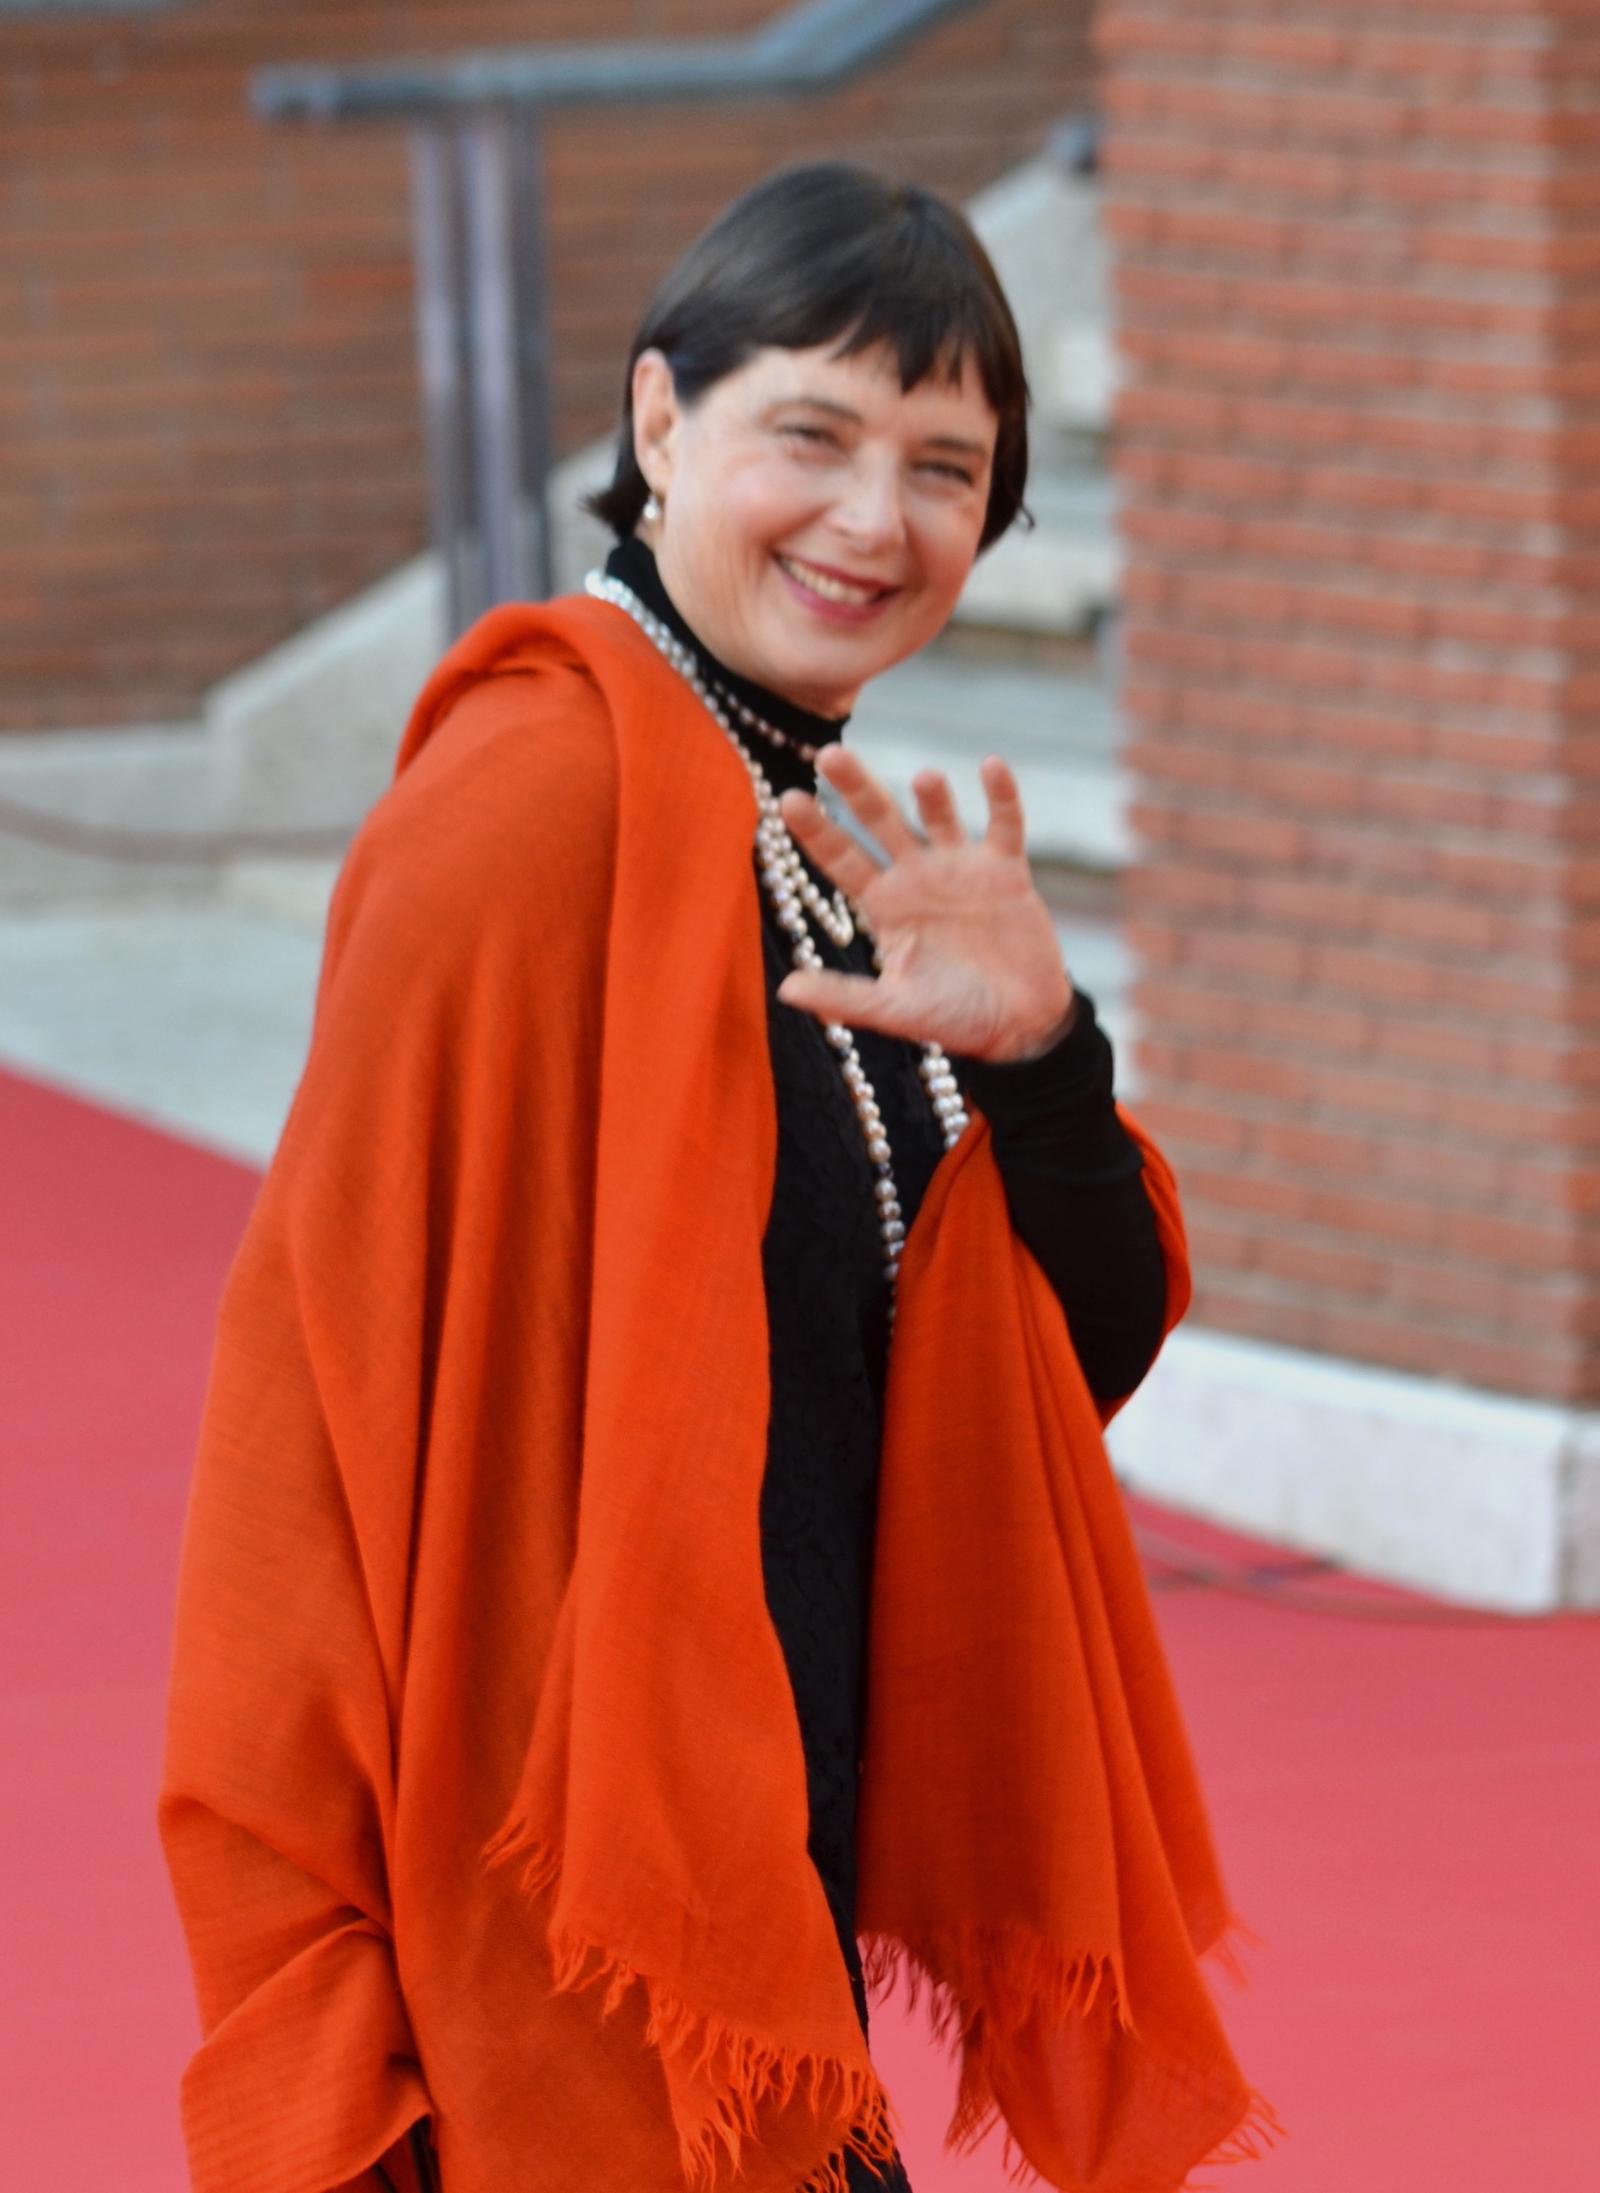 Roma 2015: Isabella Rossellini saluta i fotografi sul red carpet